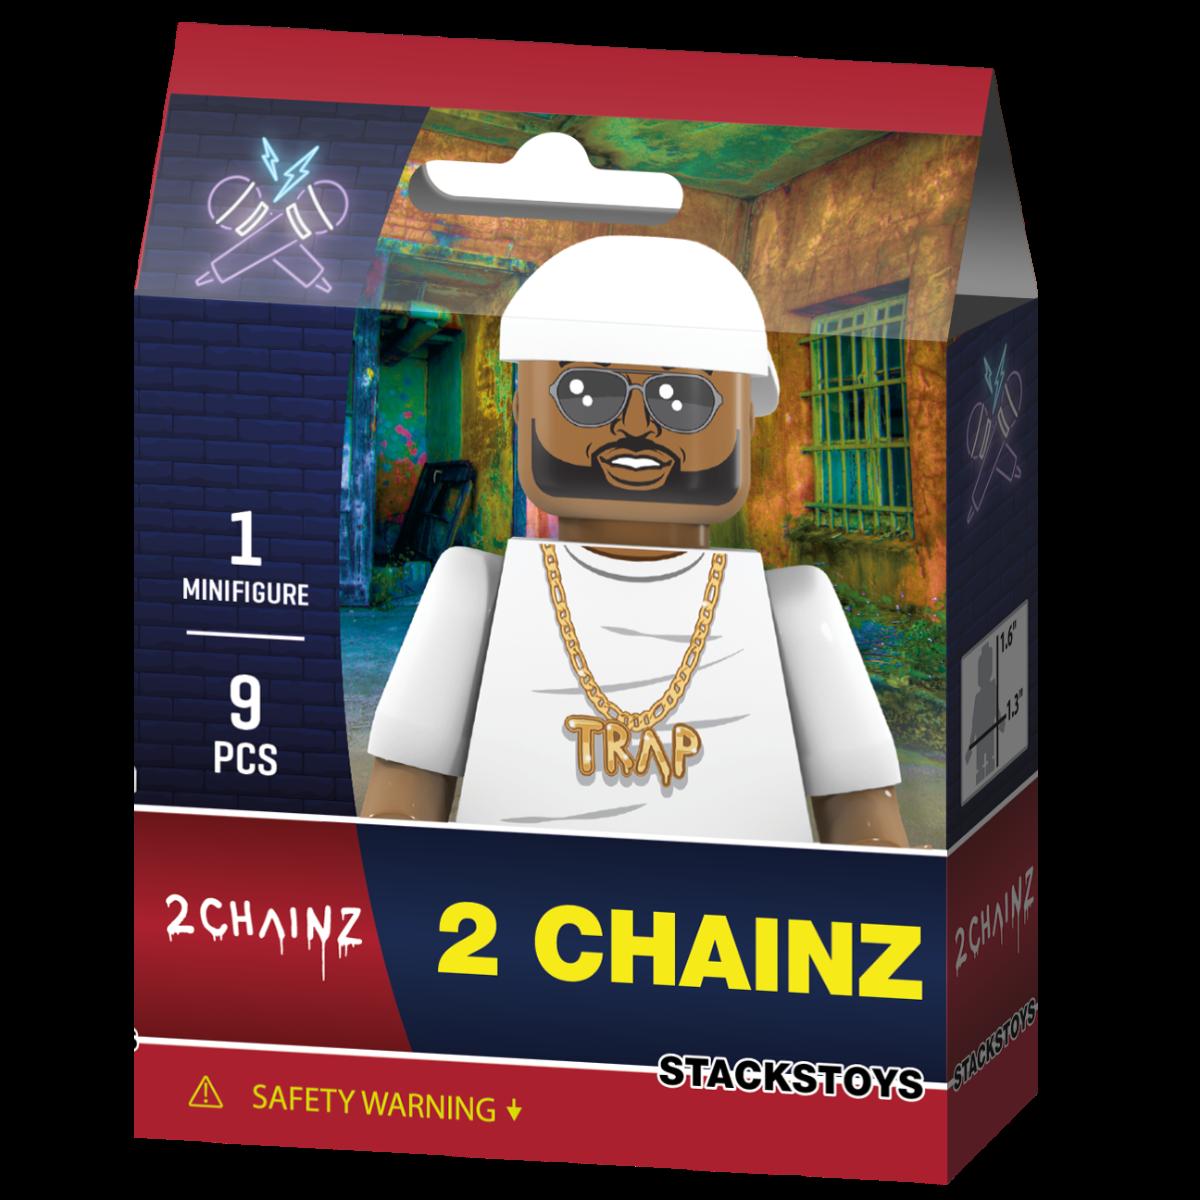 2 Chainz Minifigure